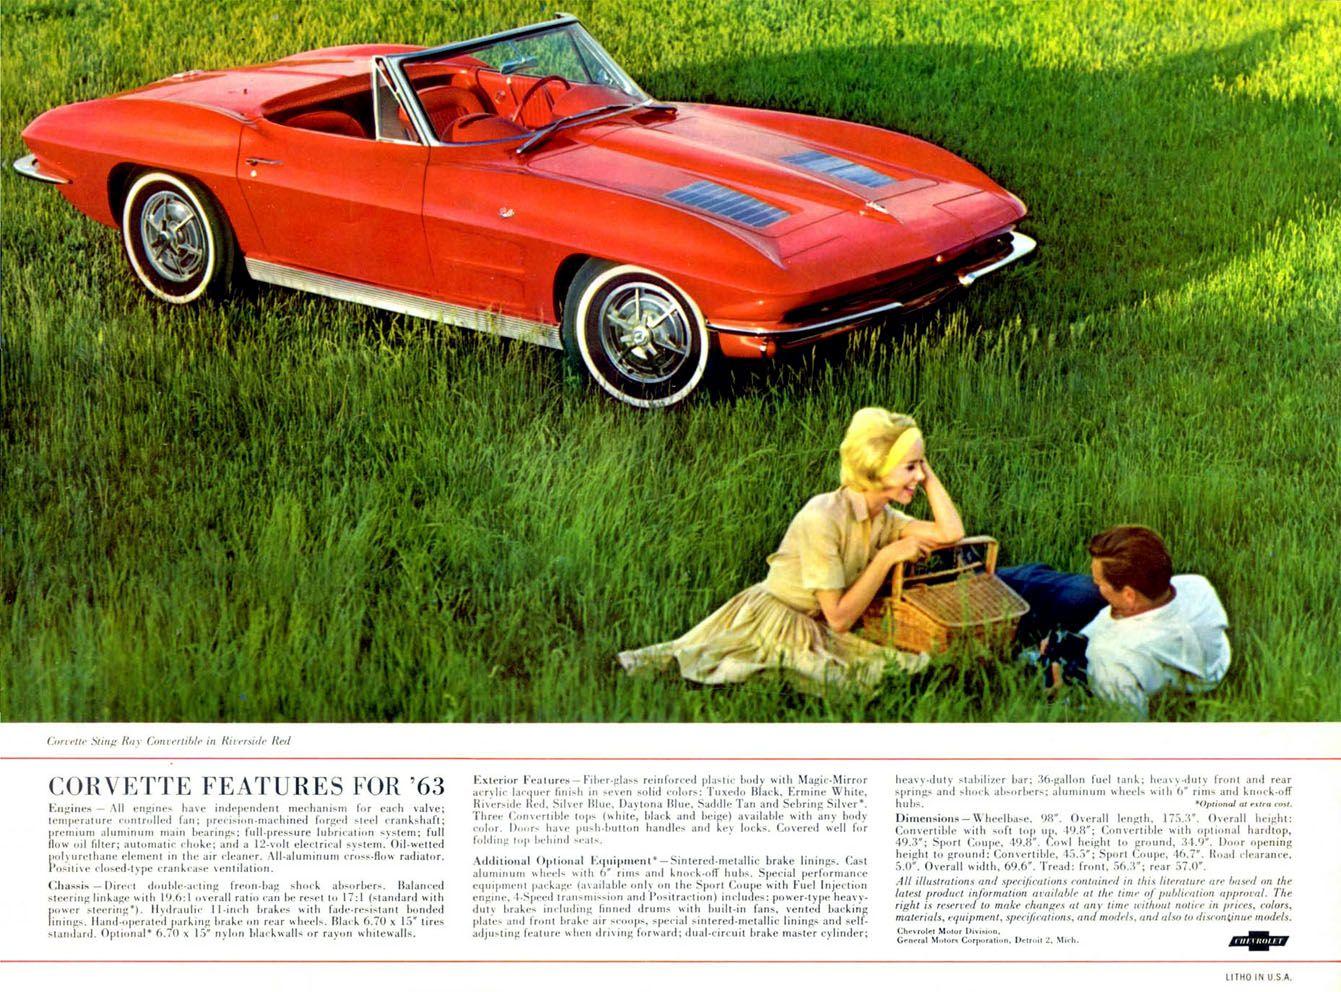 1963 Corvette | Muscle Car Ads | Pinterest | Corvette, Cars and ...